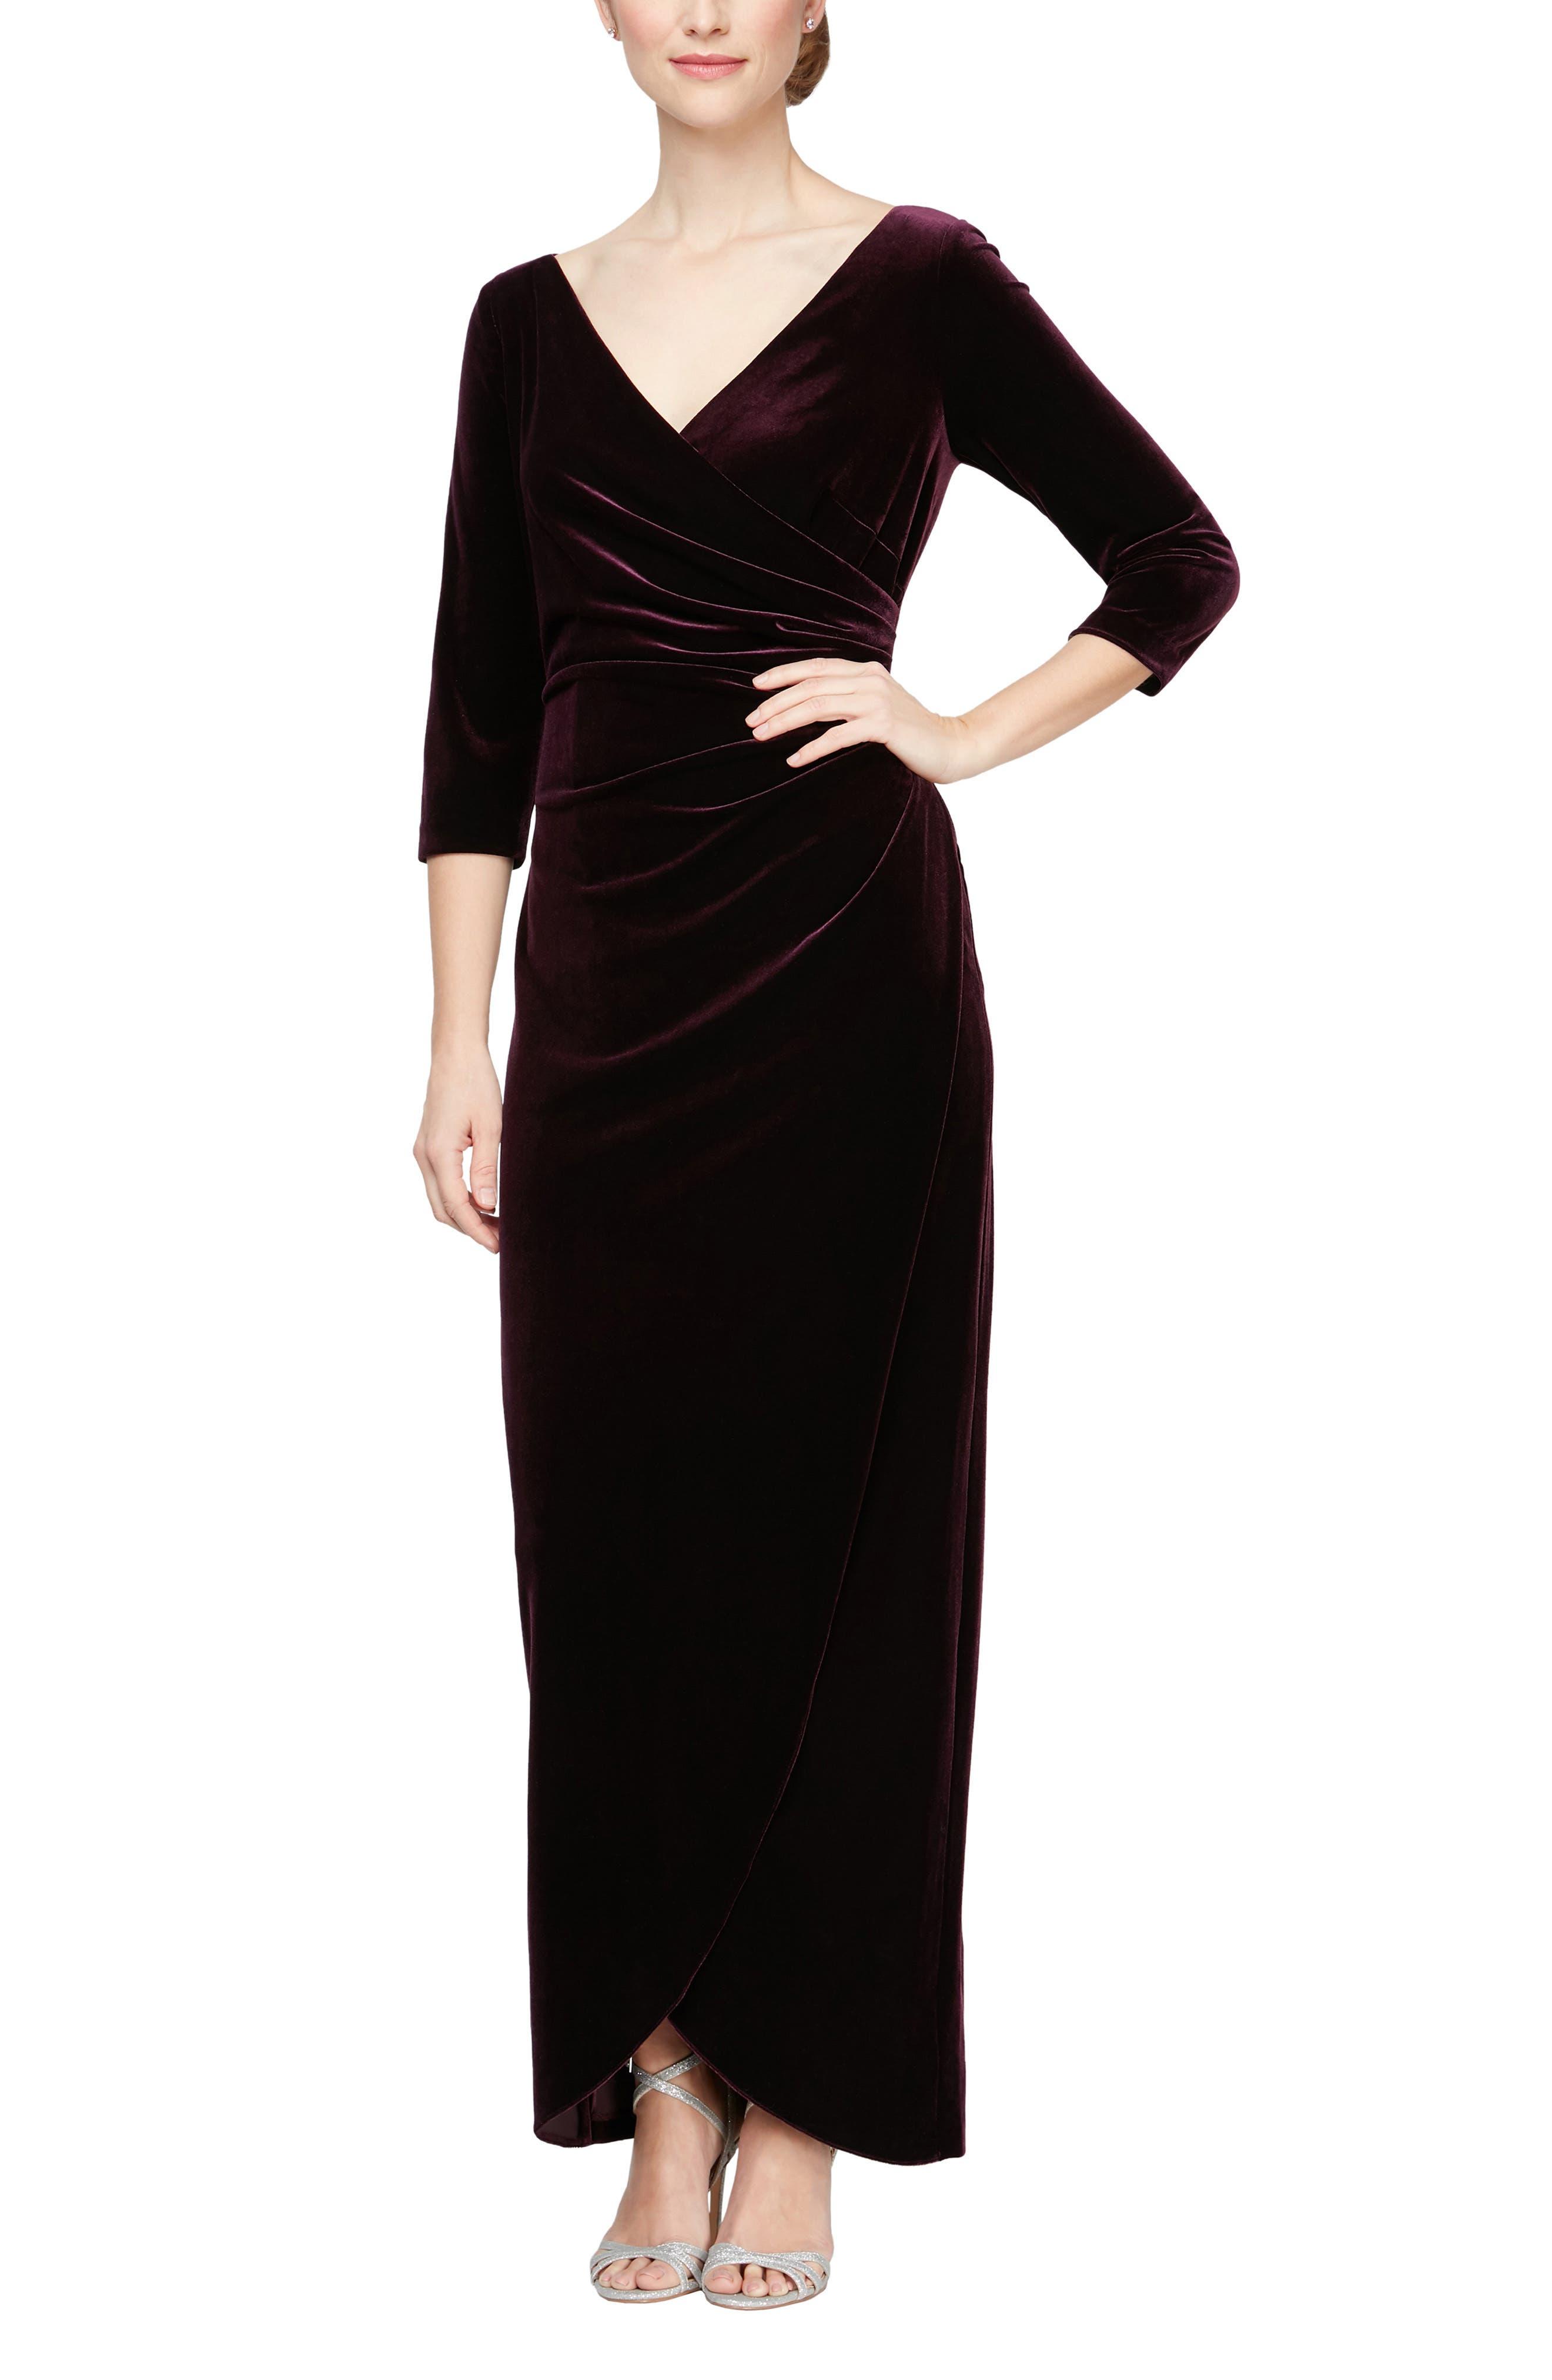 1940s Evening, Prom, Party, Formal, Ball Gowns Womens Alex Evenings Surplice Neck Velvet Gown Size 18 - Purple $169.00 AT vintagedancer.com